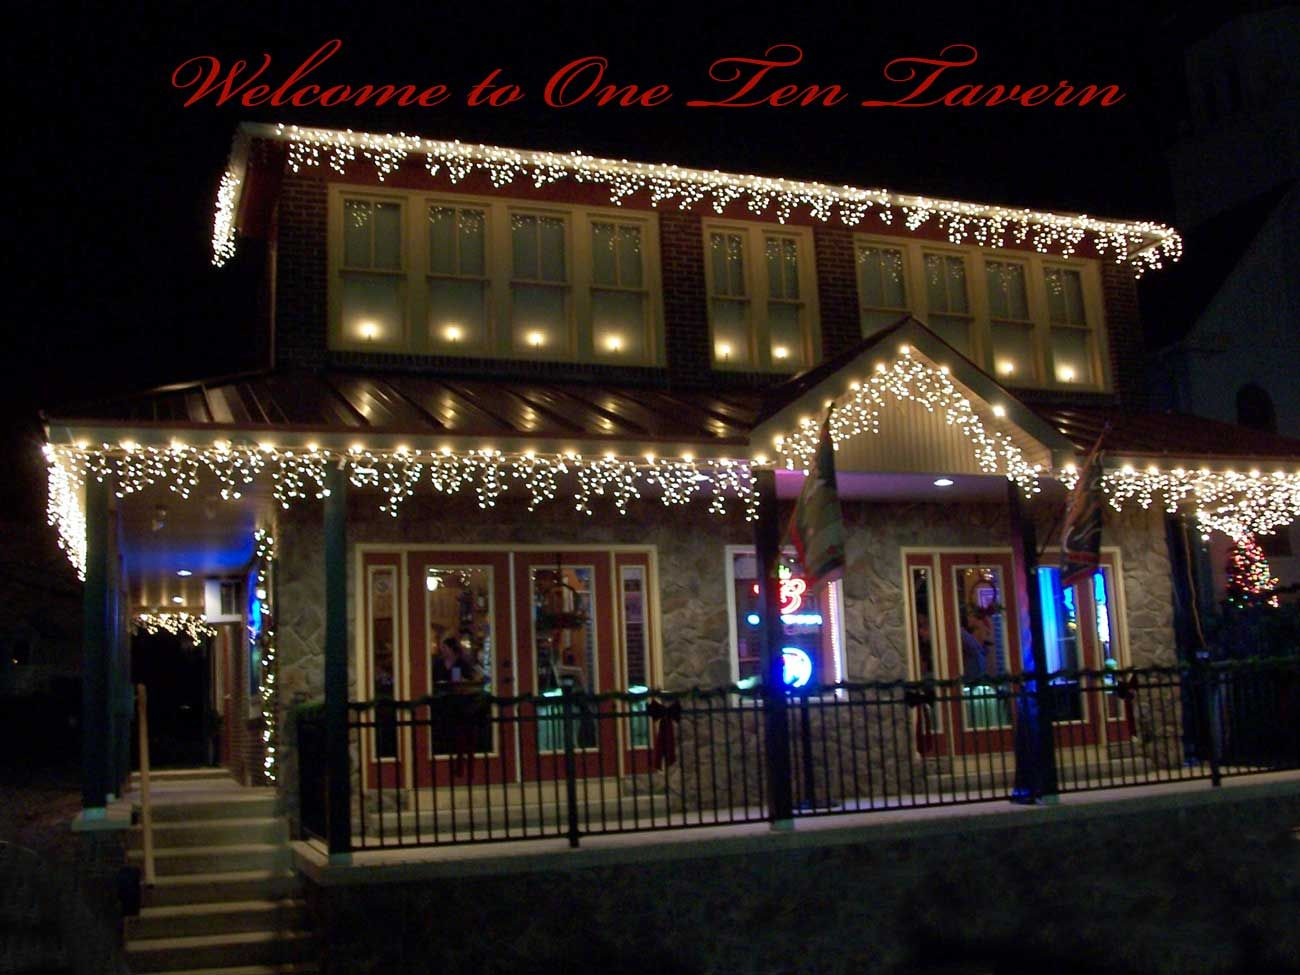 One Ten Tavern, Palmerton PA Sports bar, Tavern